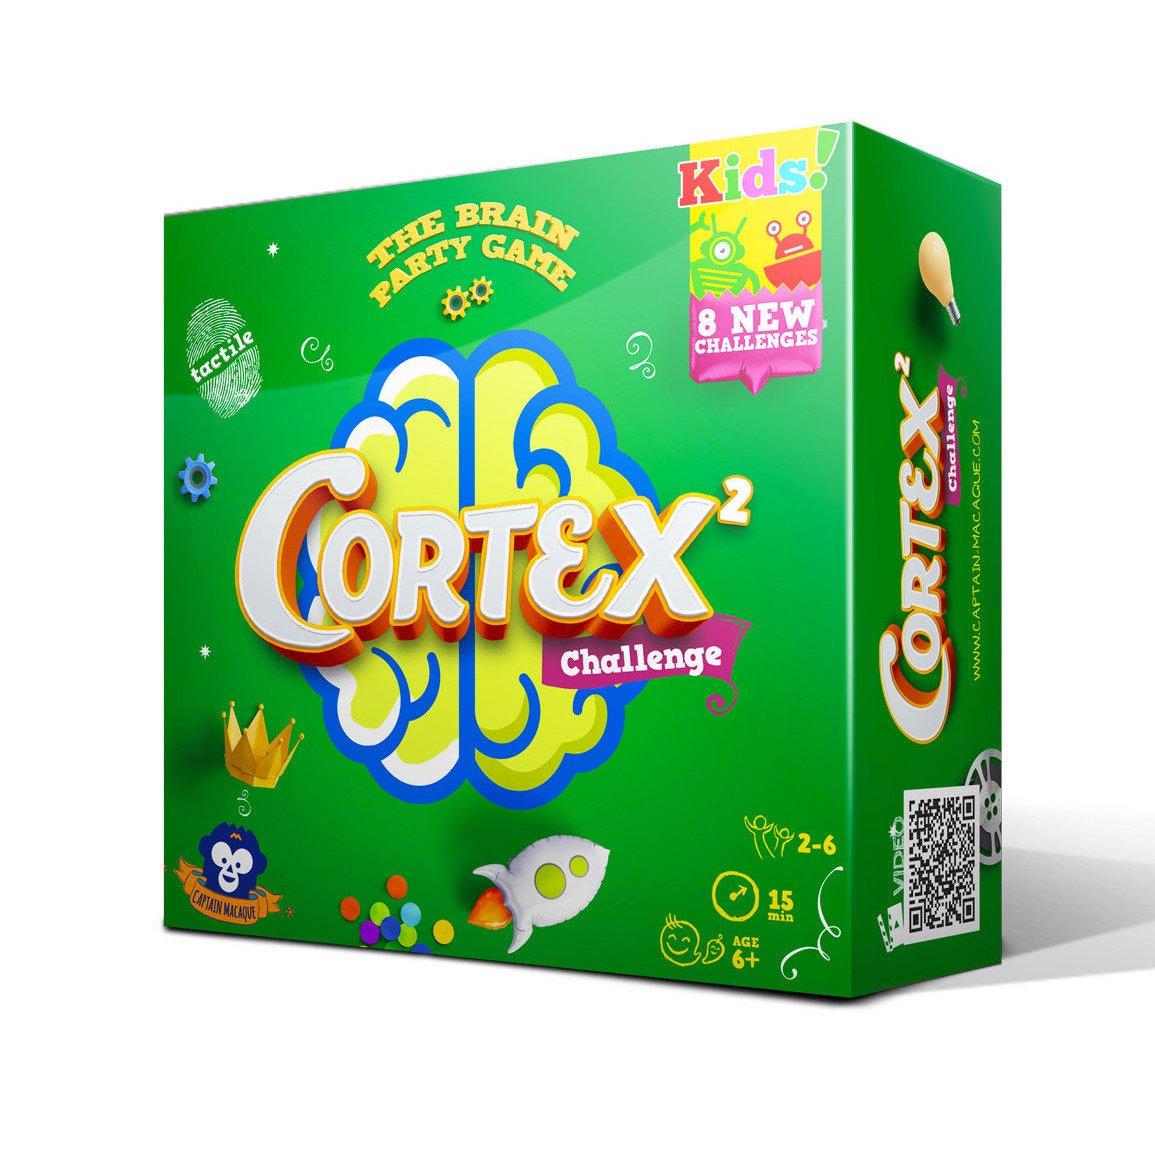 Cortex Challenge Kids 2  (Lingua: Italiano, Inglese, Francese, Tedesco, Olandese, Spagnolo - Stato: Nuovo)